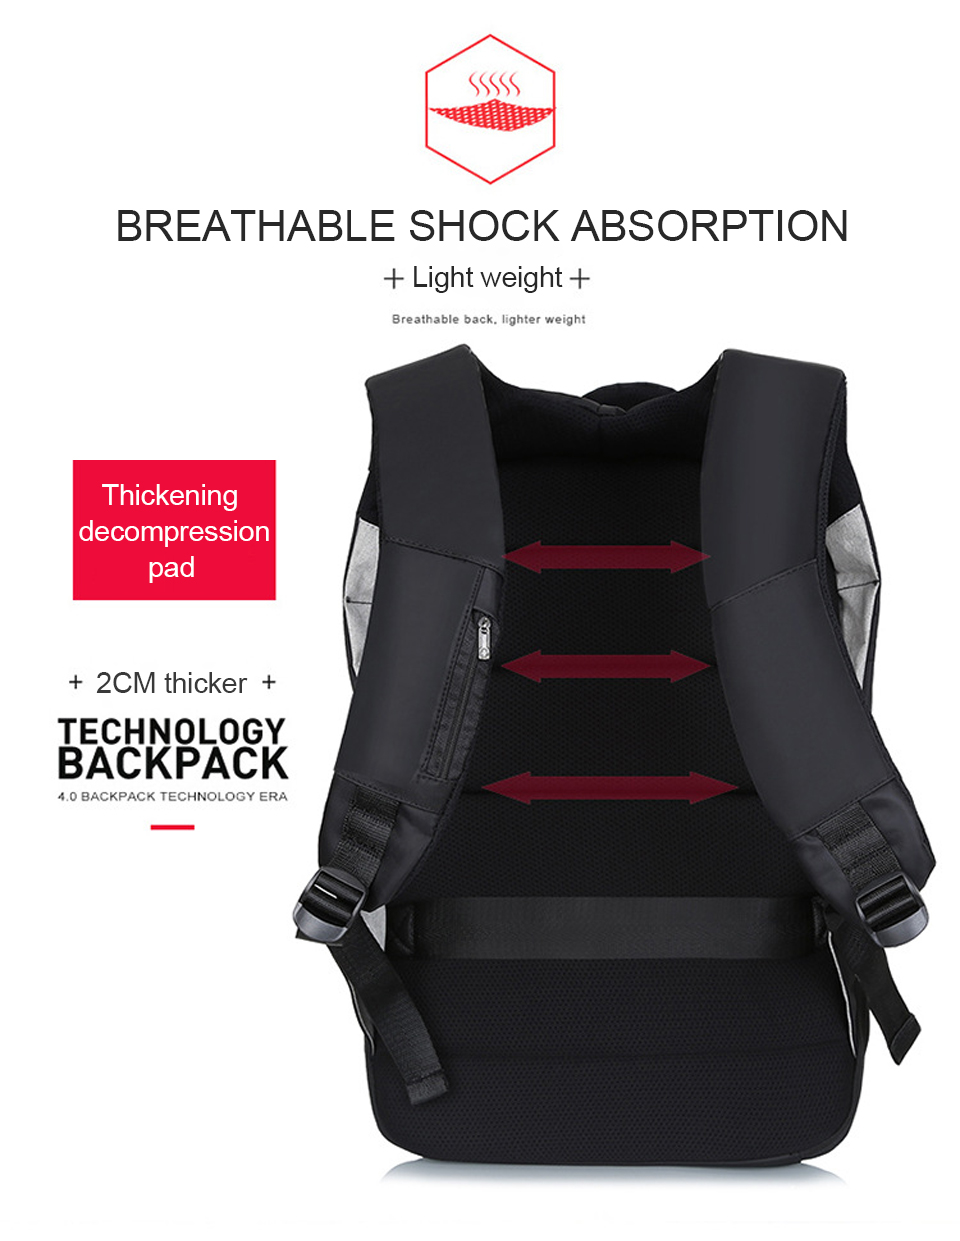 17''-Anti-theft-Backpack-Bag-Mens-Women-Male-Mochila-Outdoor-Travel-Bags-15.6-Inch-Laptop-Backpacks-USB-Charging-Backpacking-Men_05